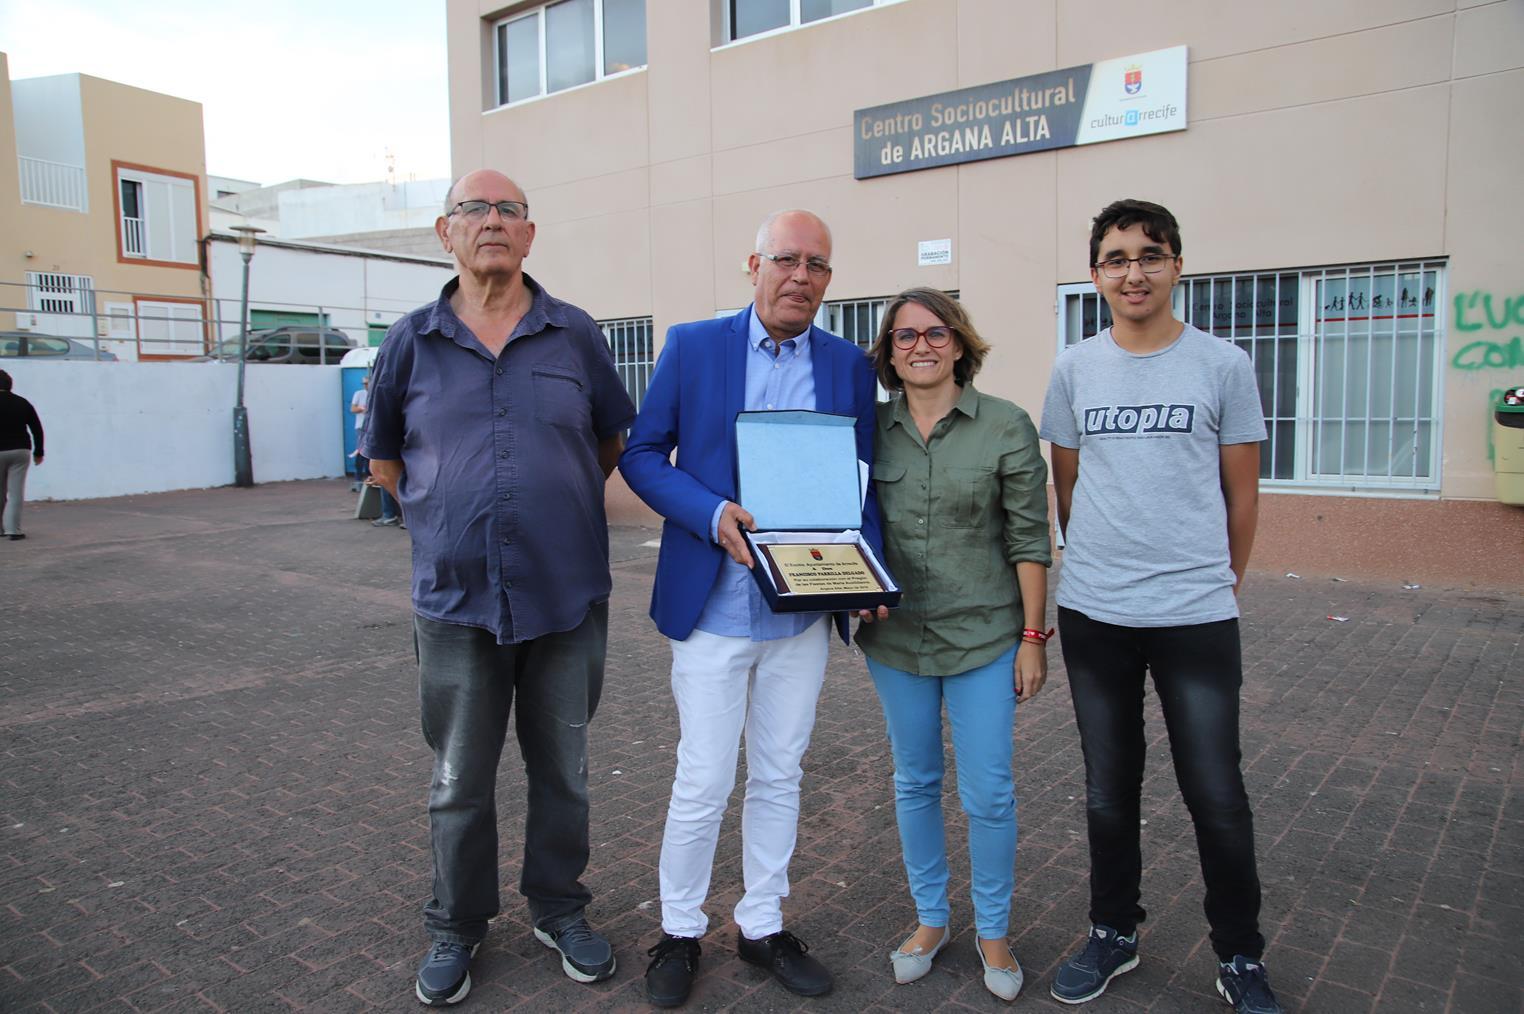 Pregón de Paco Parrilla en Argana Alta 2019